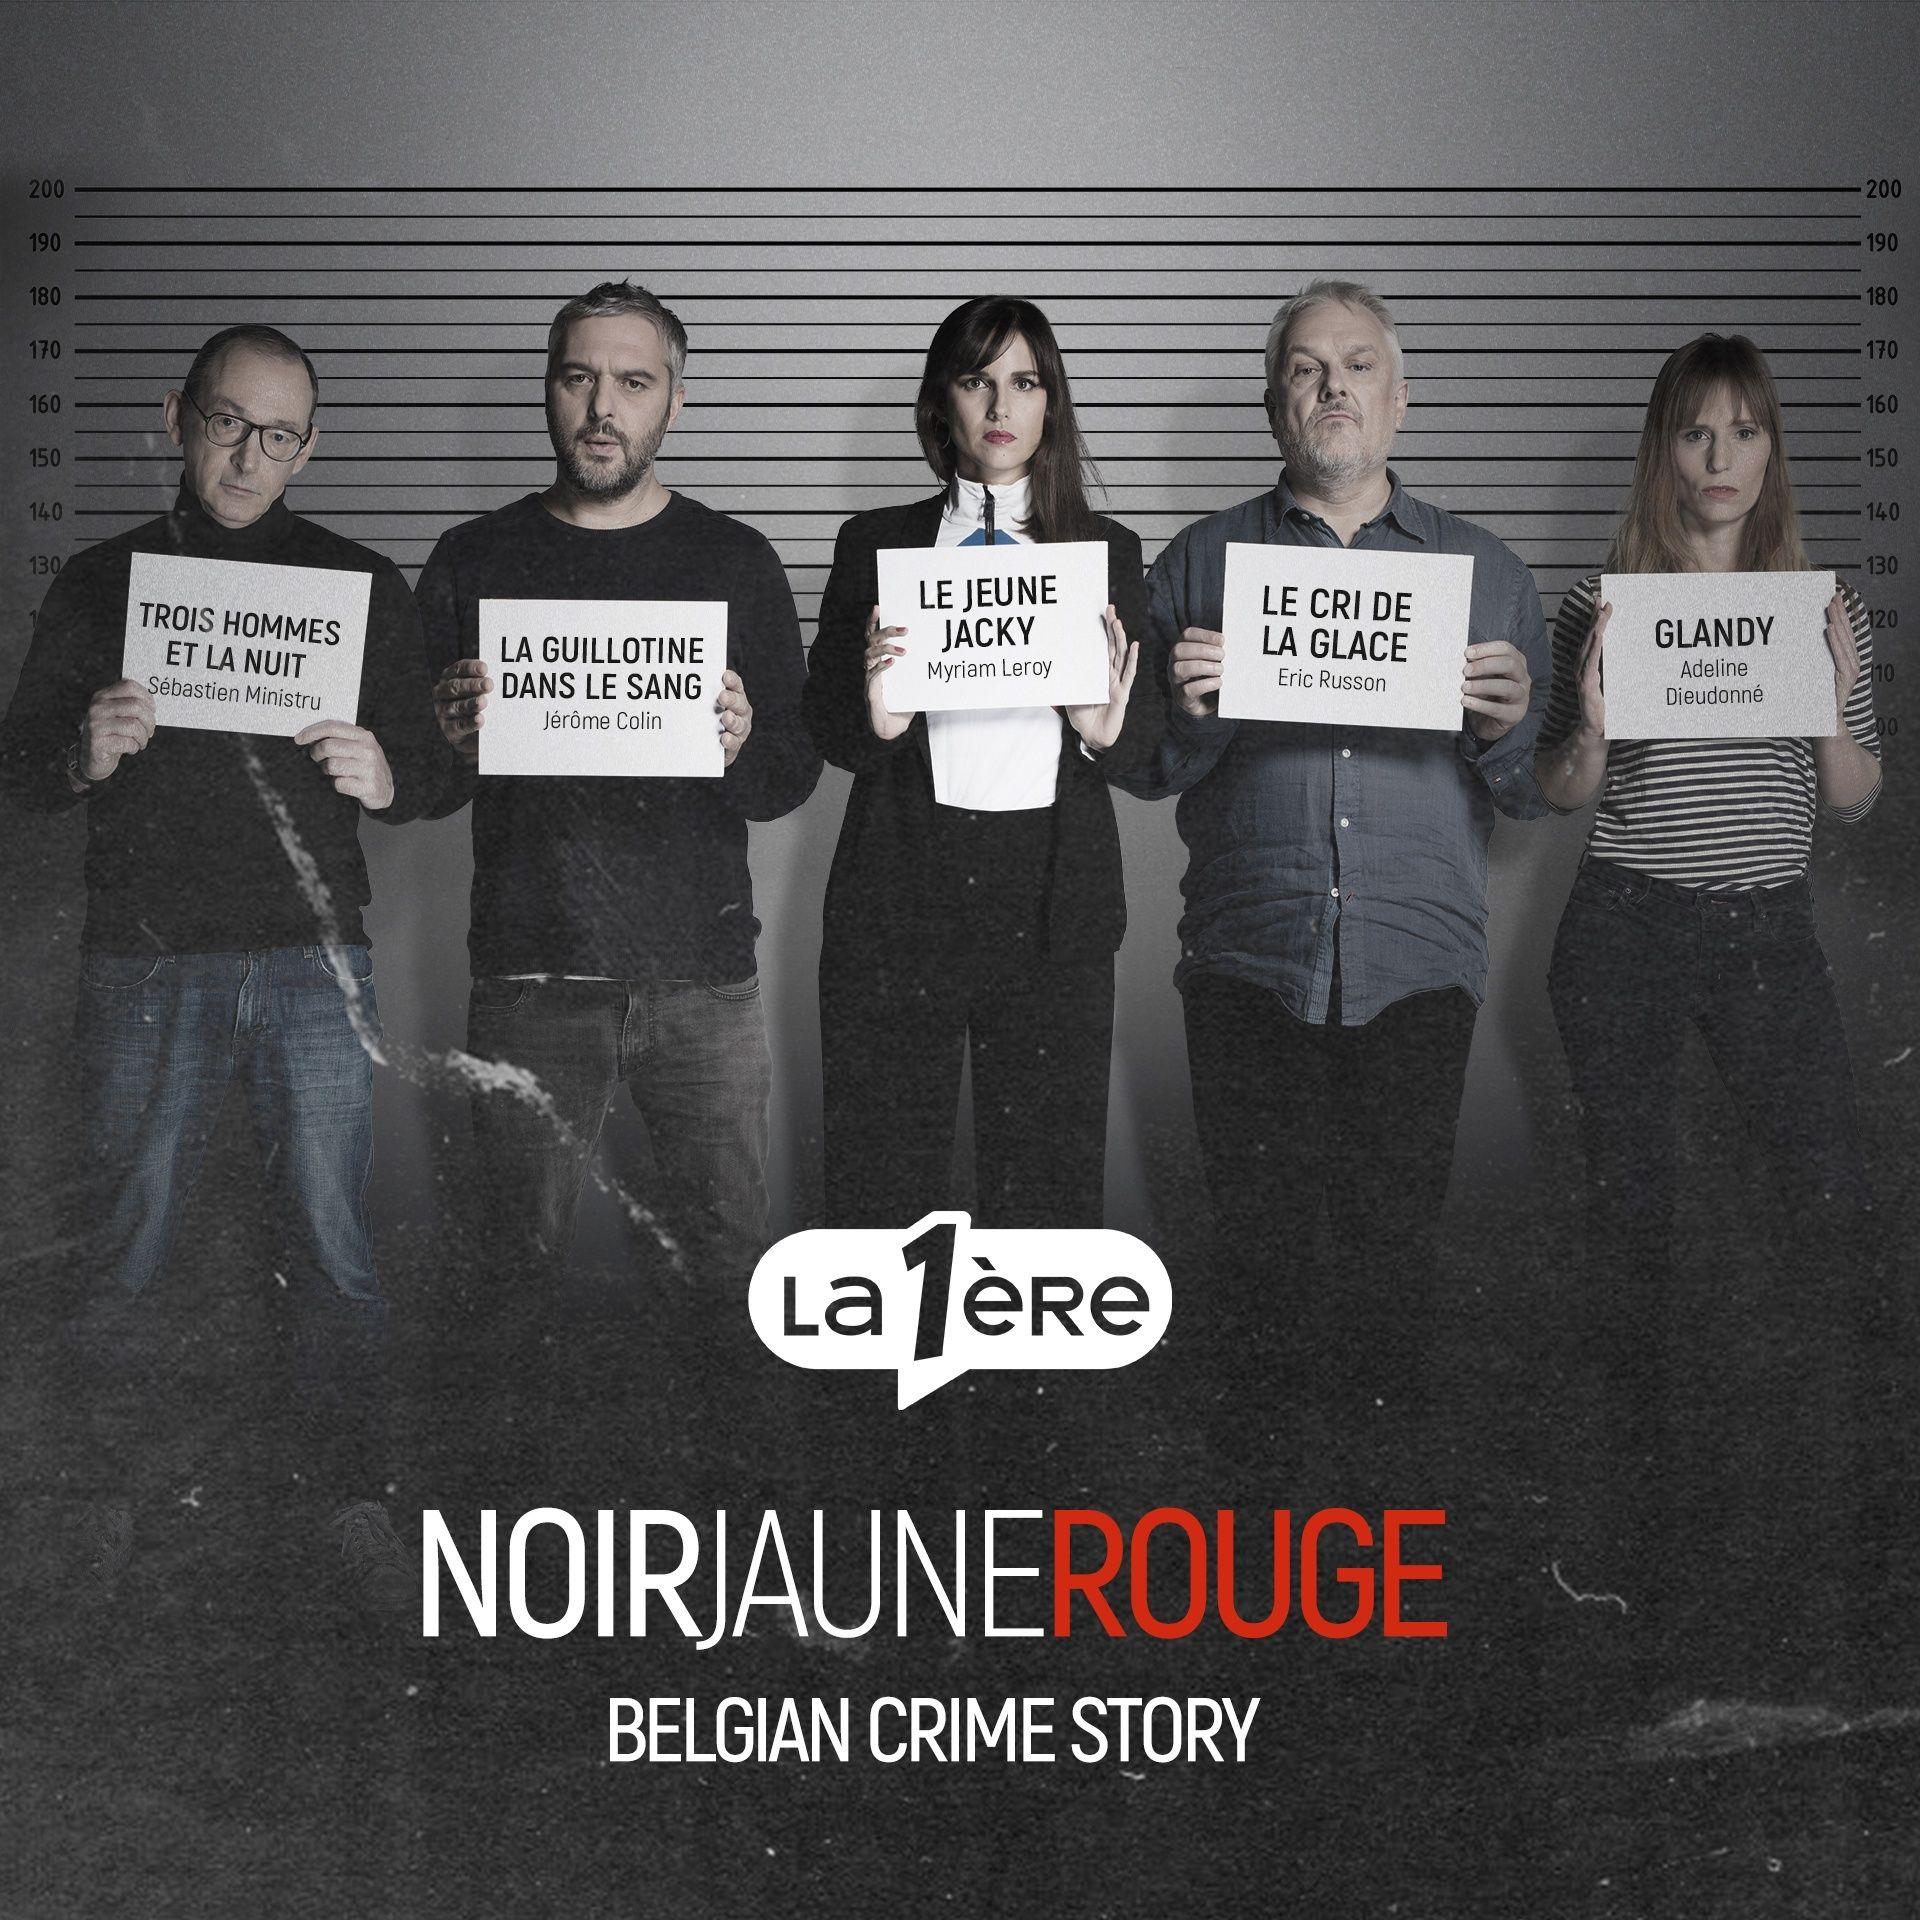 S01 – Bande-annonce – NOIR Jaune ROUGE – Belgian Crime Story